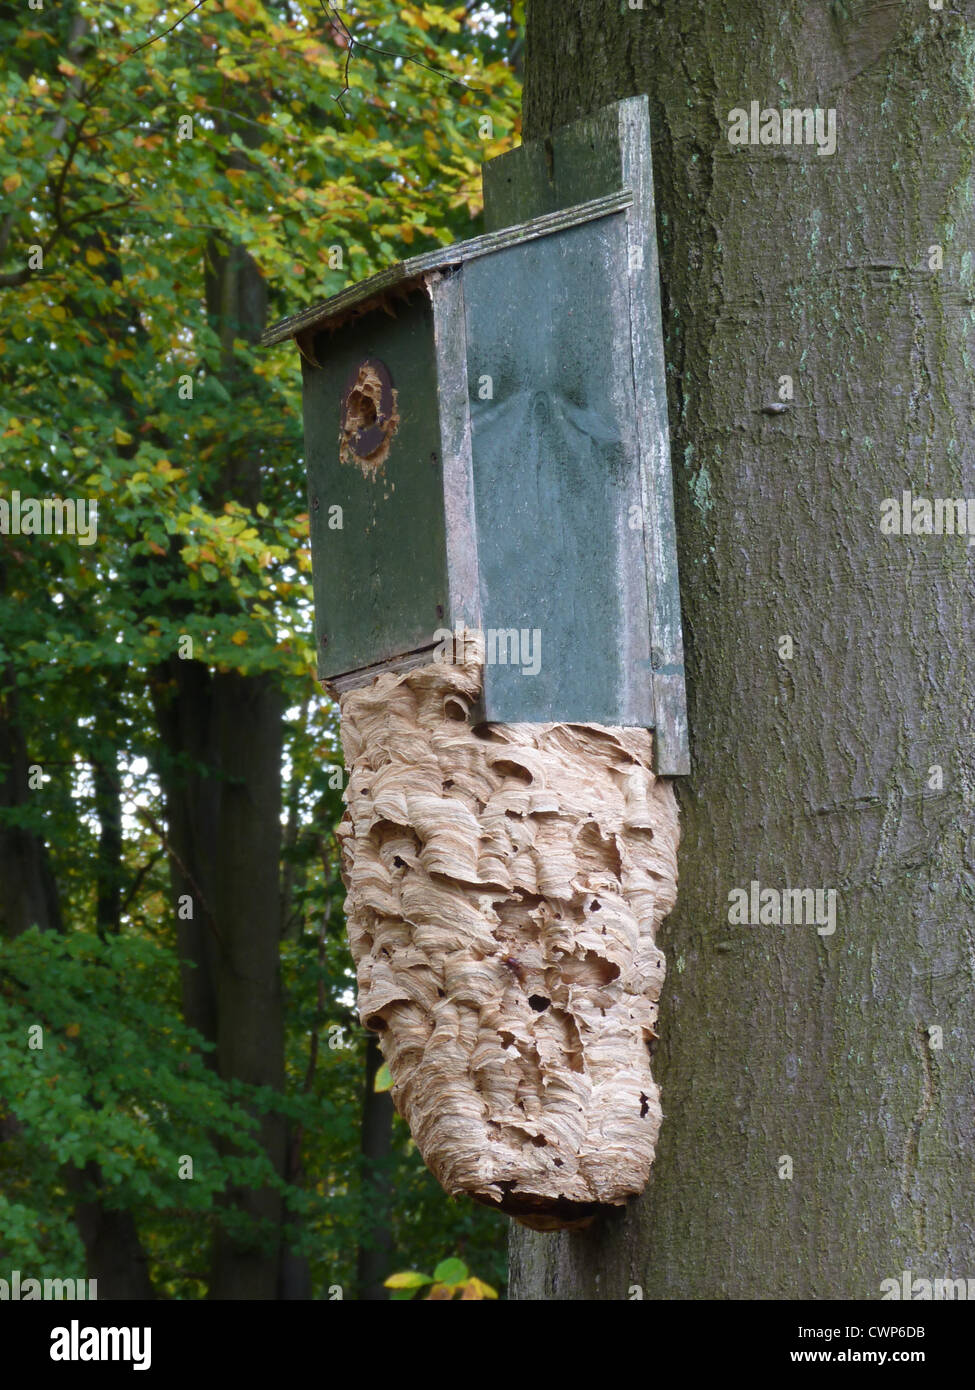 european hornet vespa crabro nest on birdbox fixed to